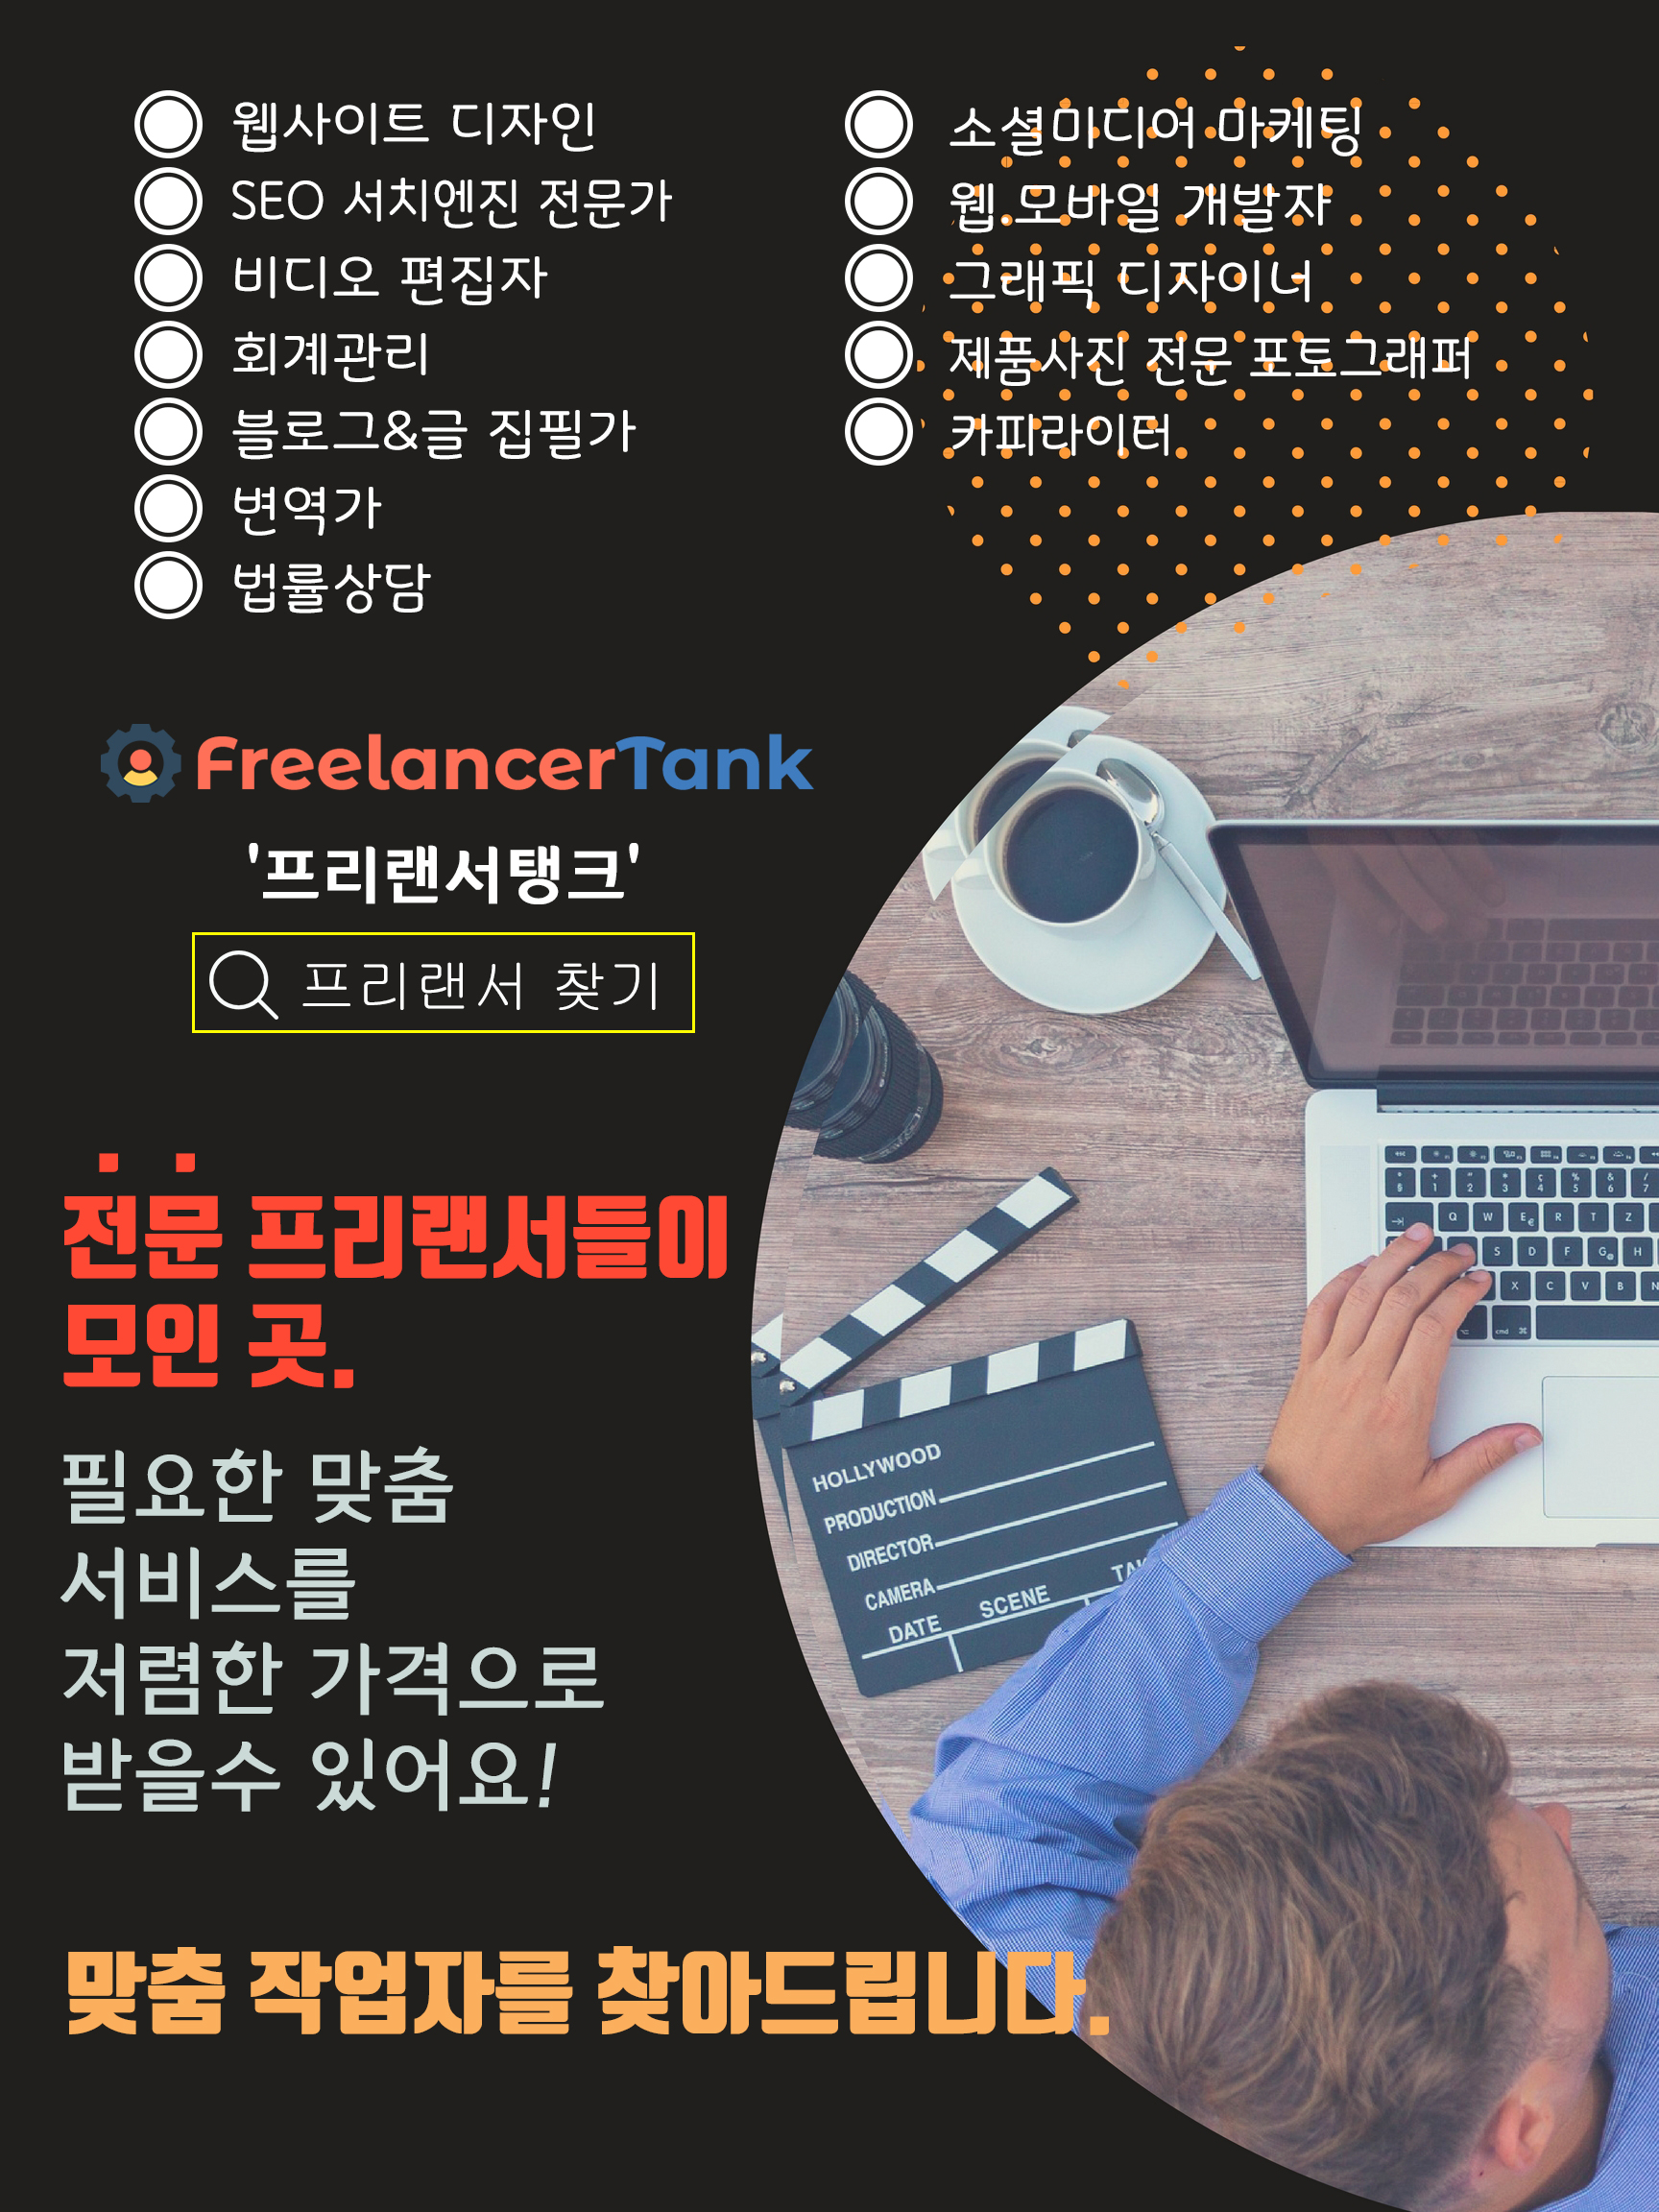 Growing Your Business using Freelancer Tank_kor.jpg